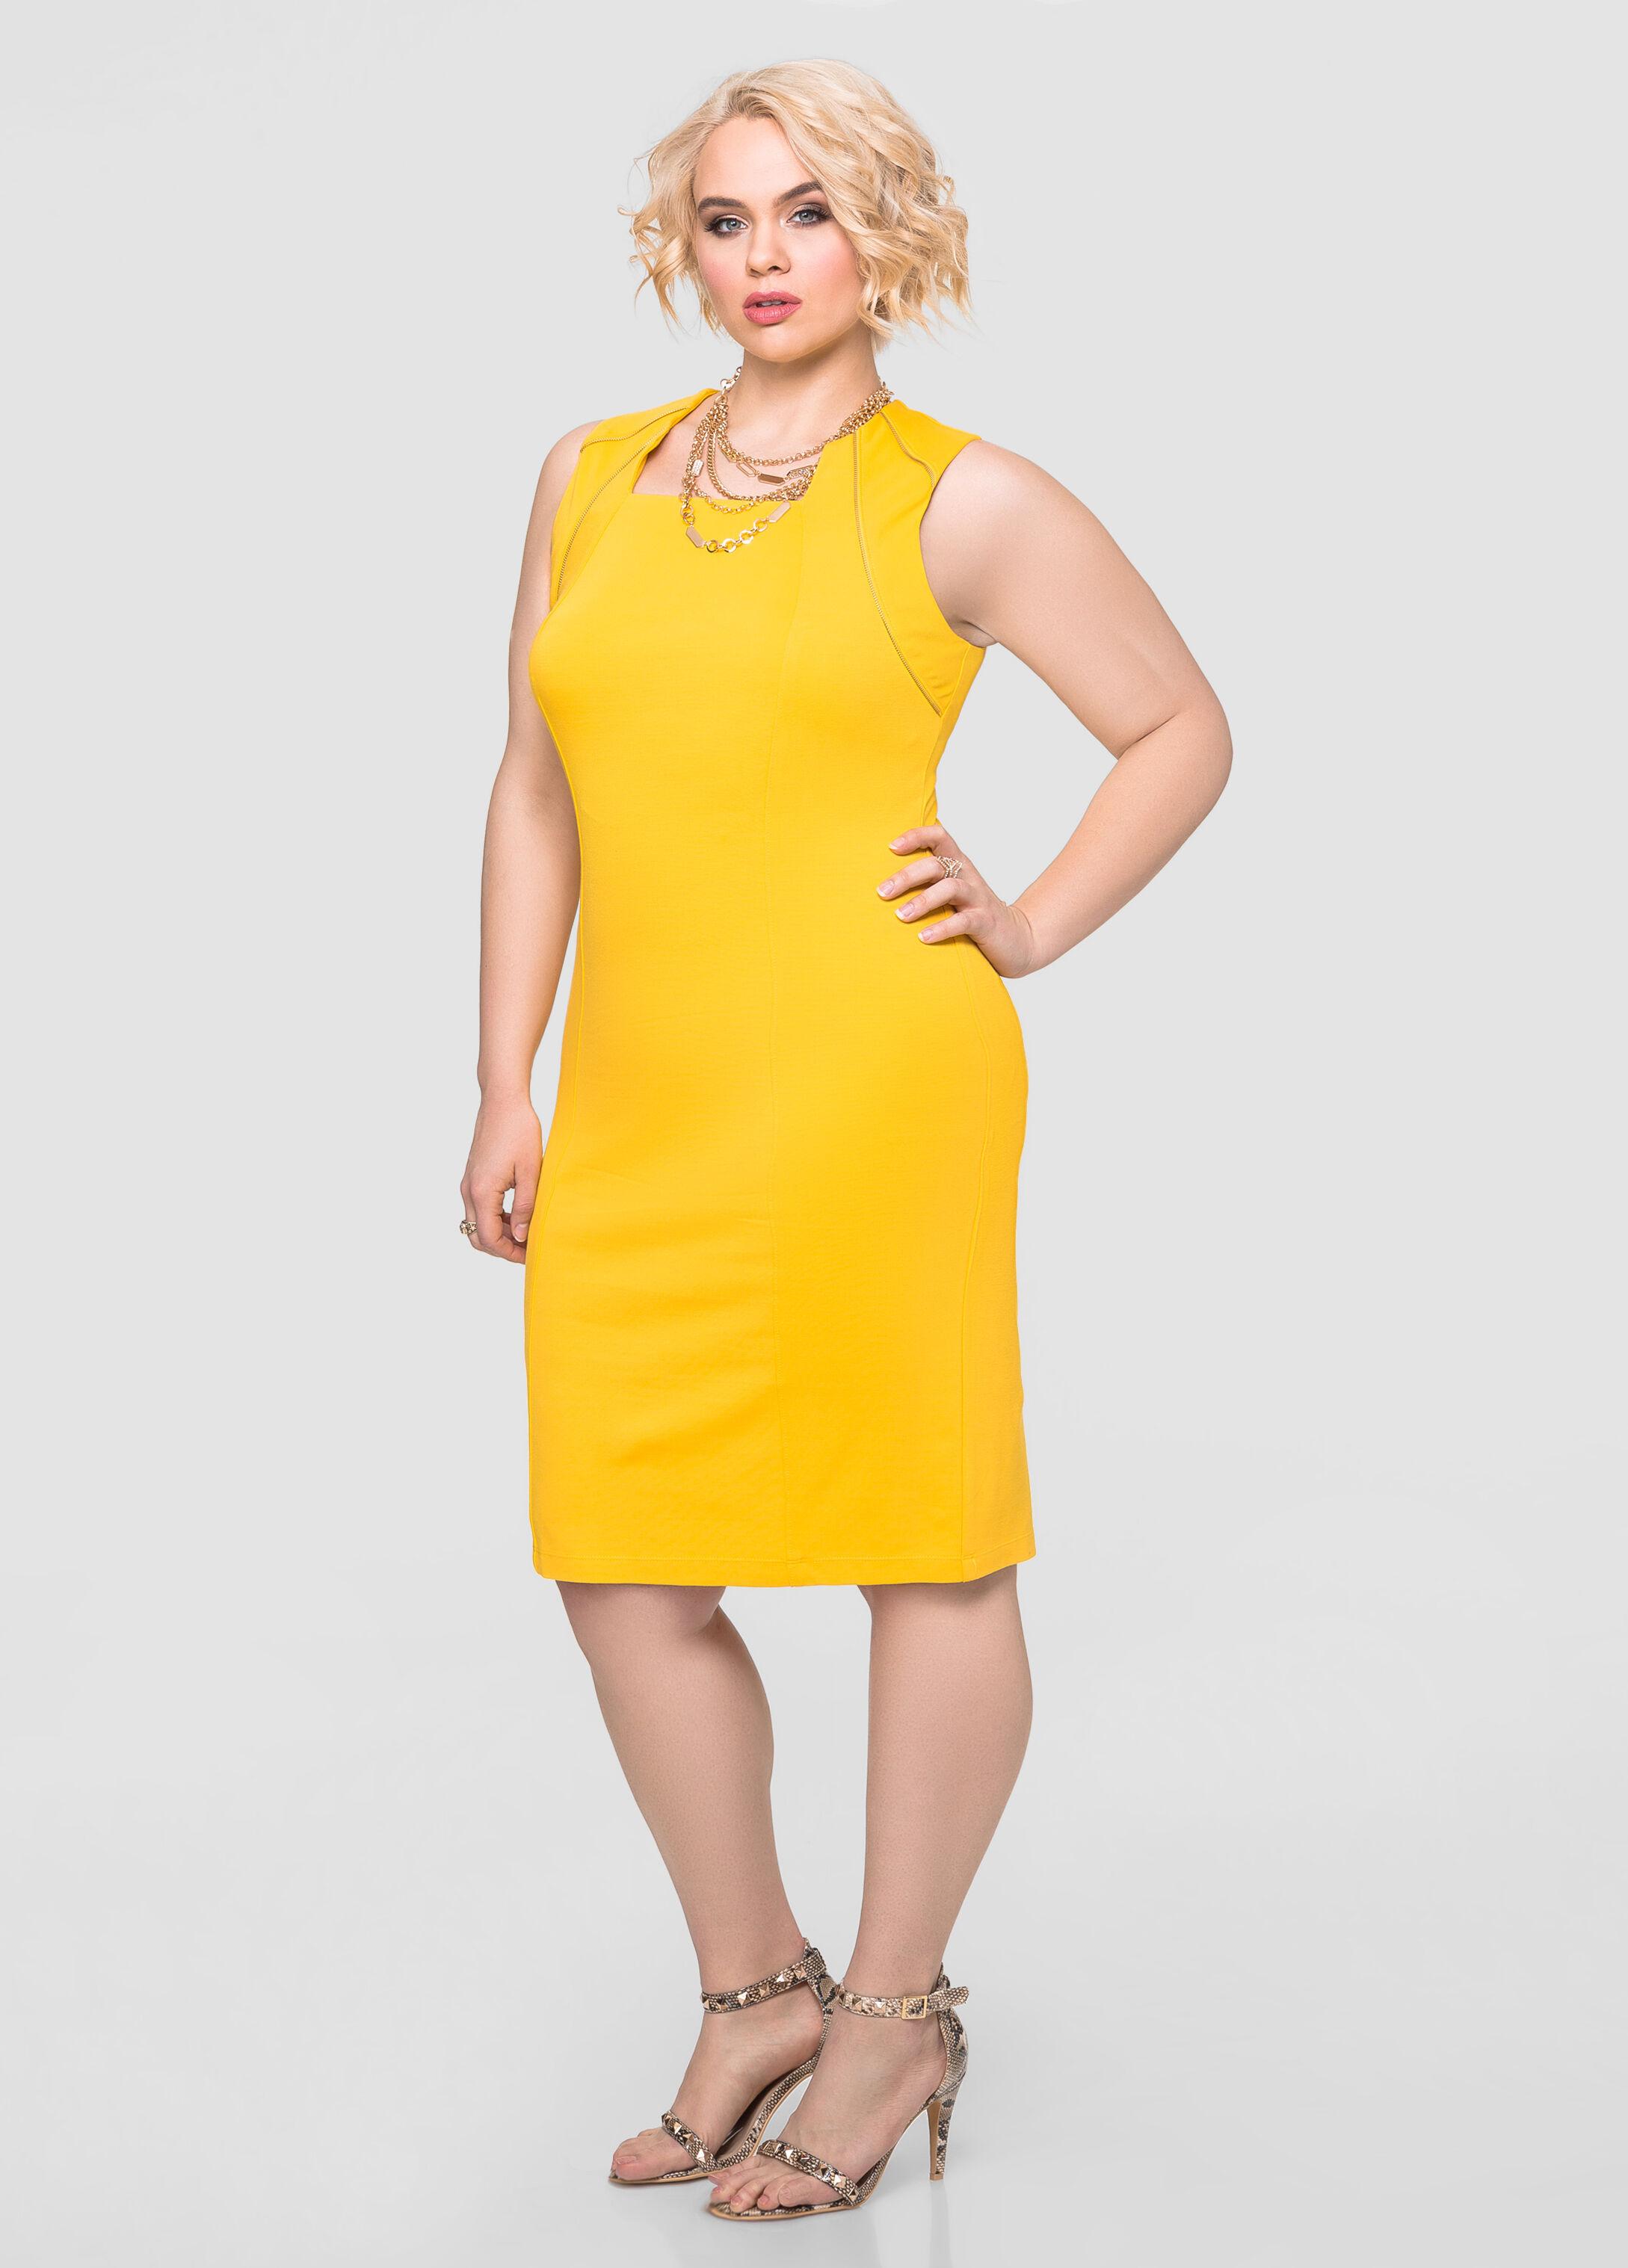 yellow zip dress a day